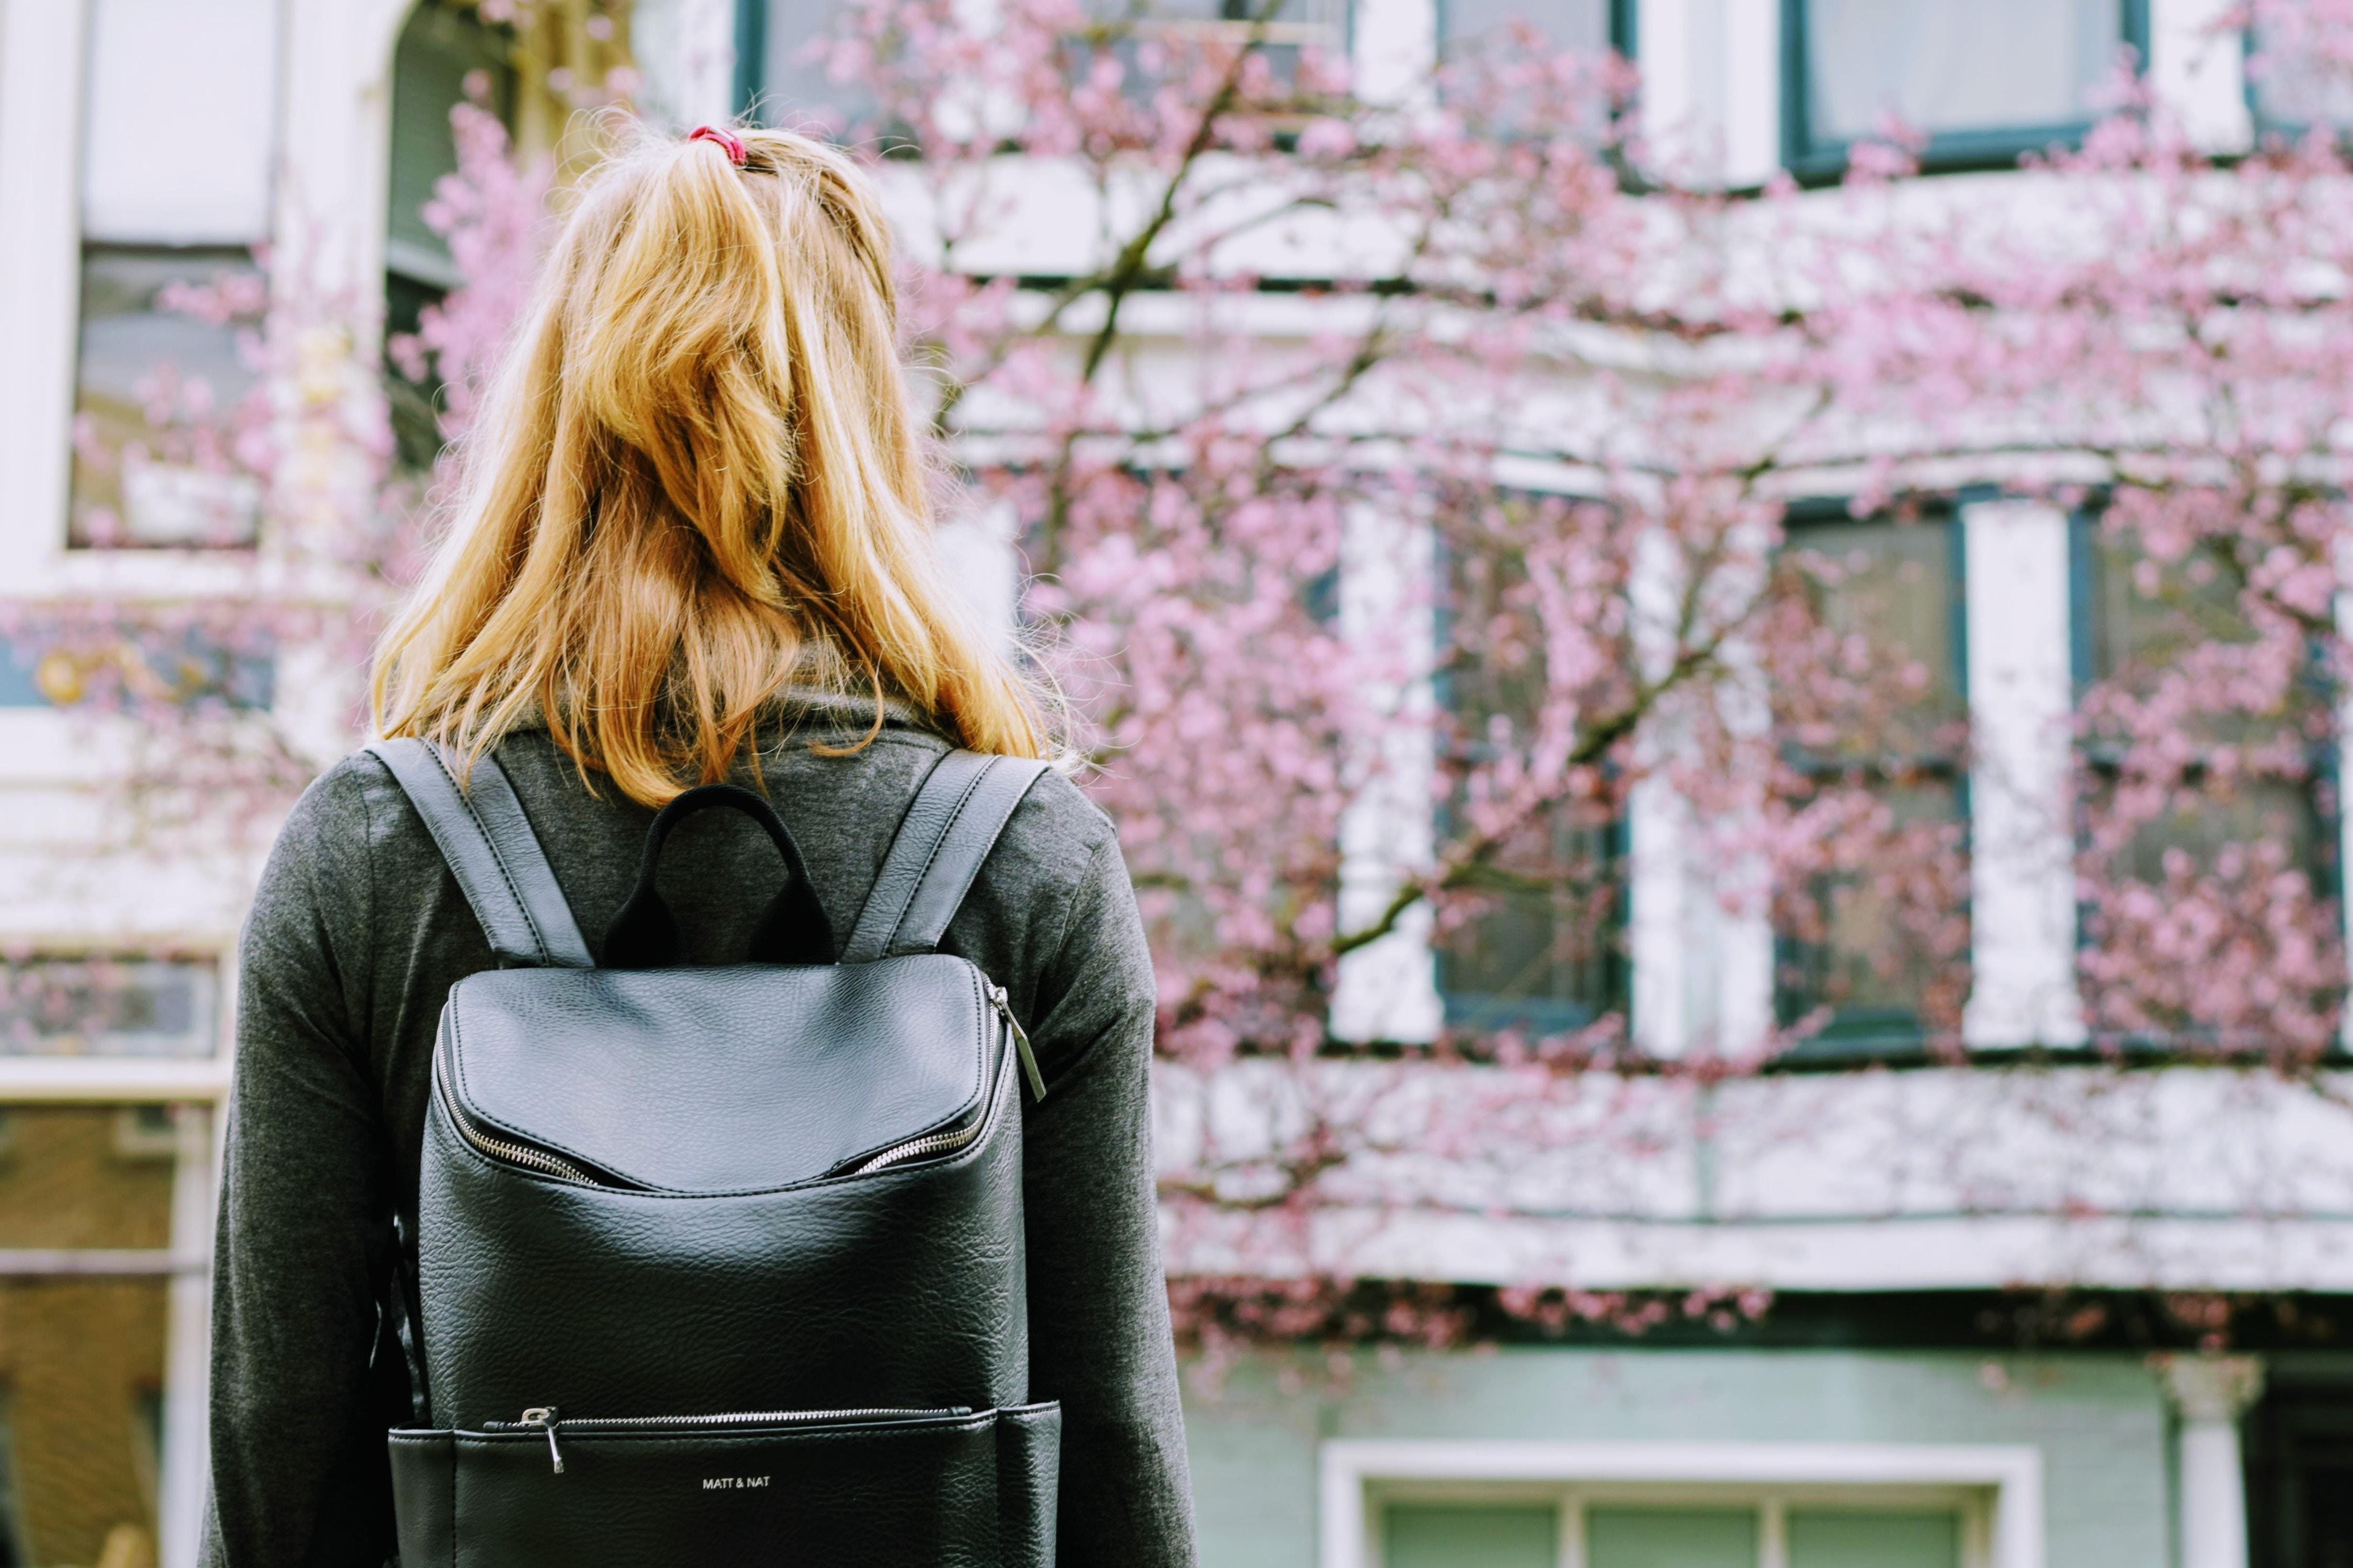 backpack tim-gouw-227623-unsplash